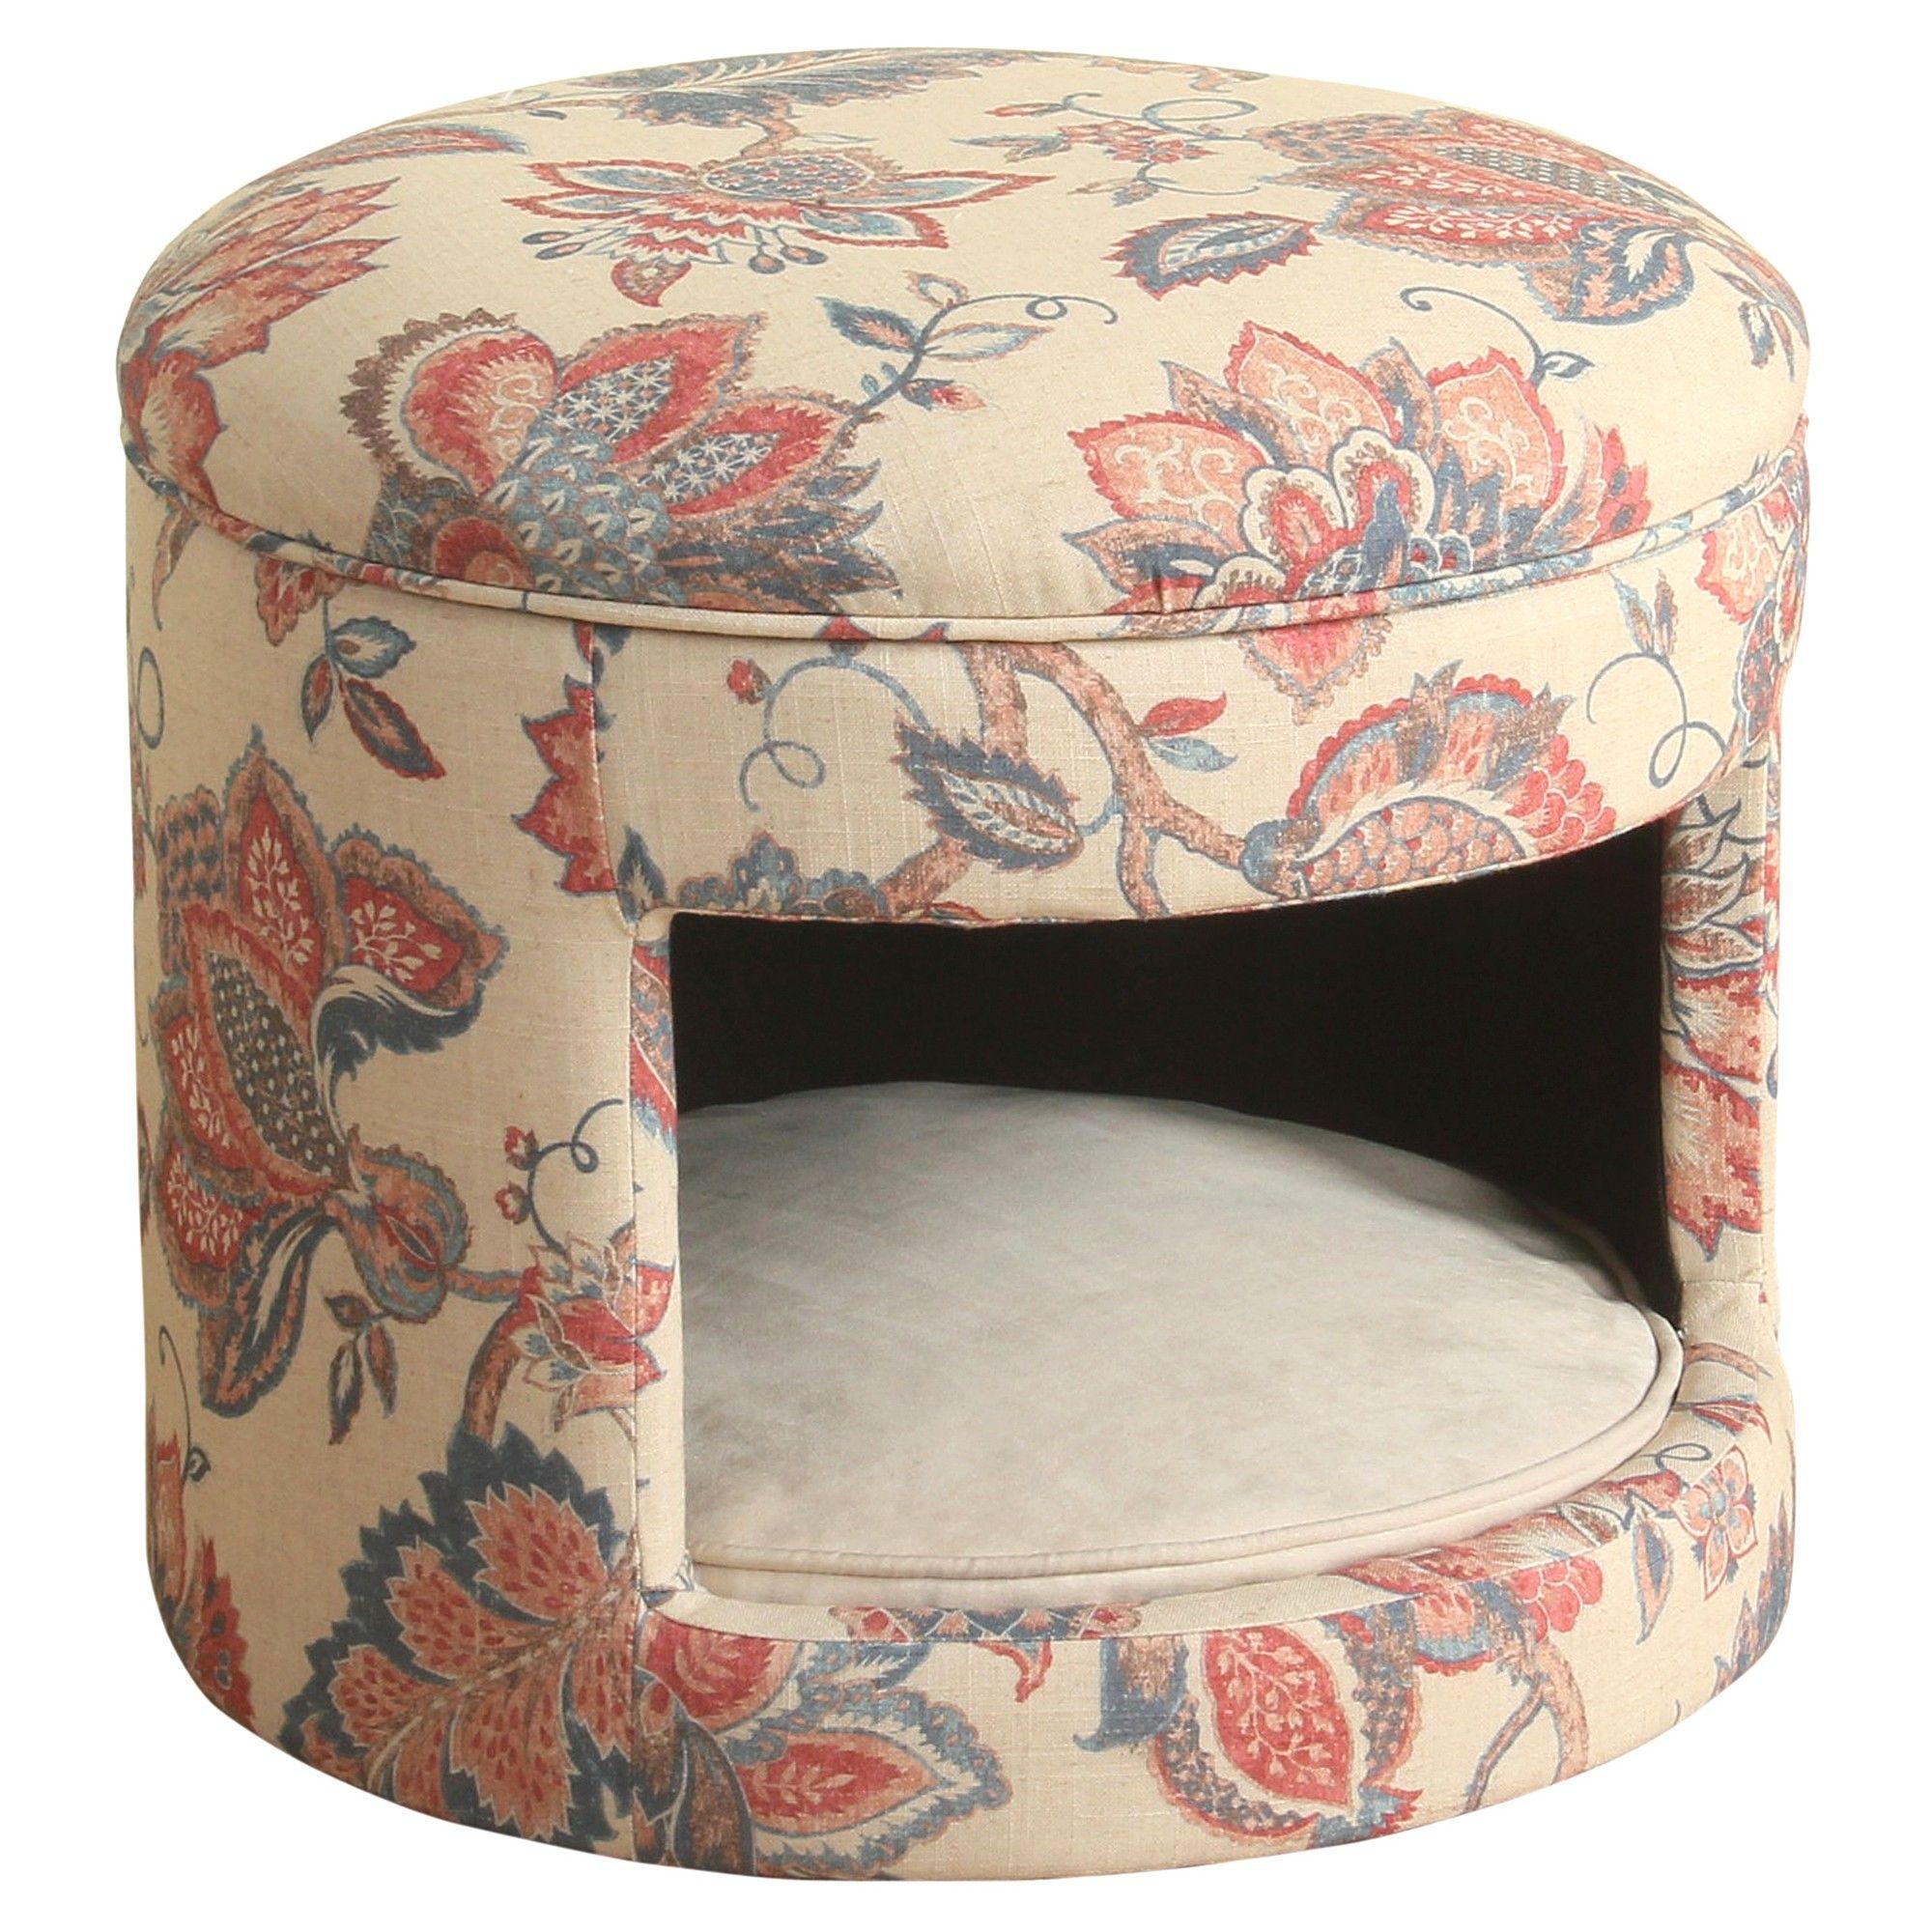 Homepop Decorative Round Hideaway Ottoman Dog Bed